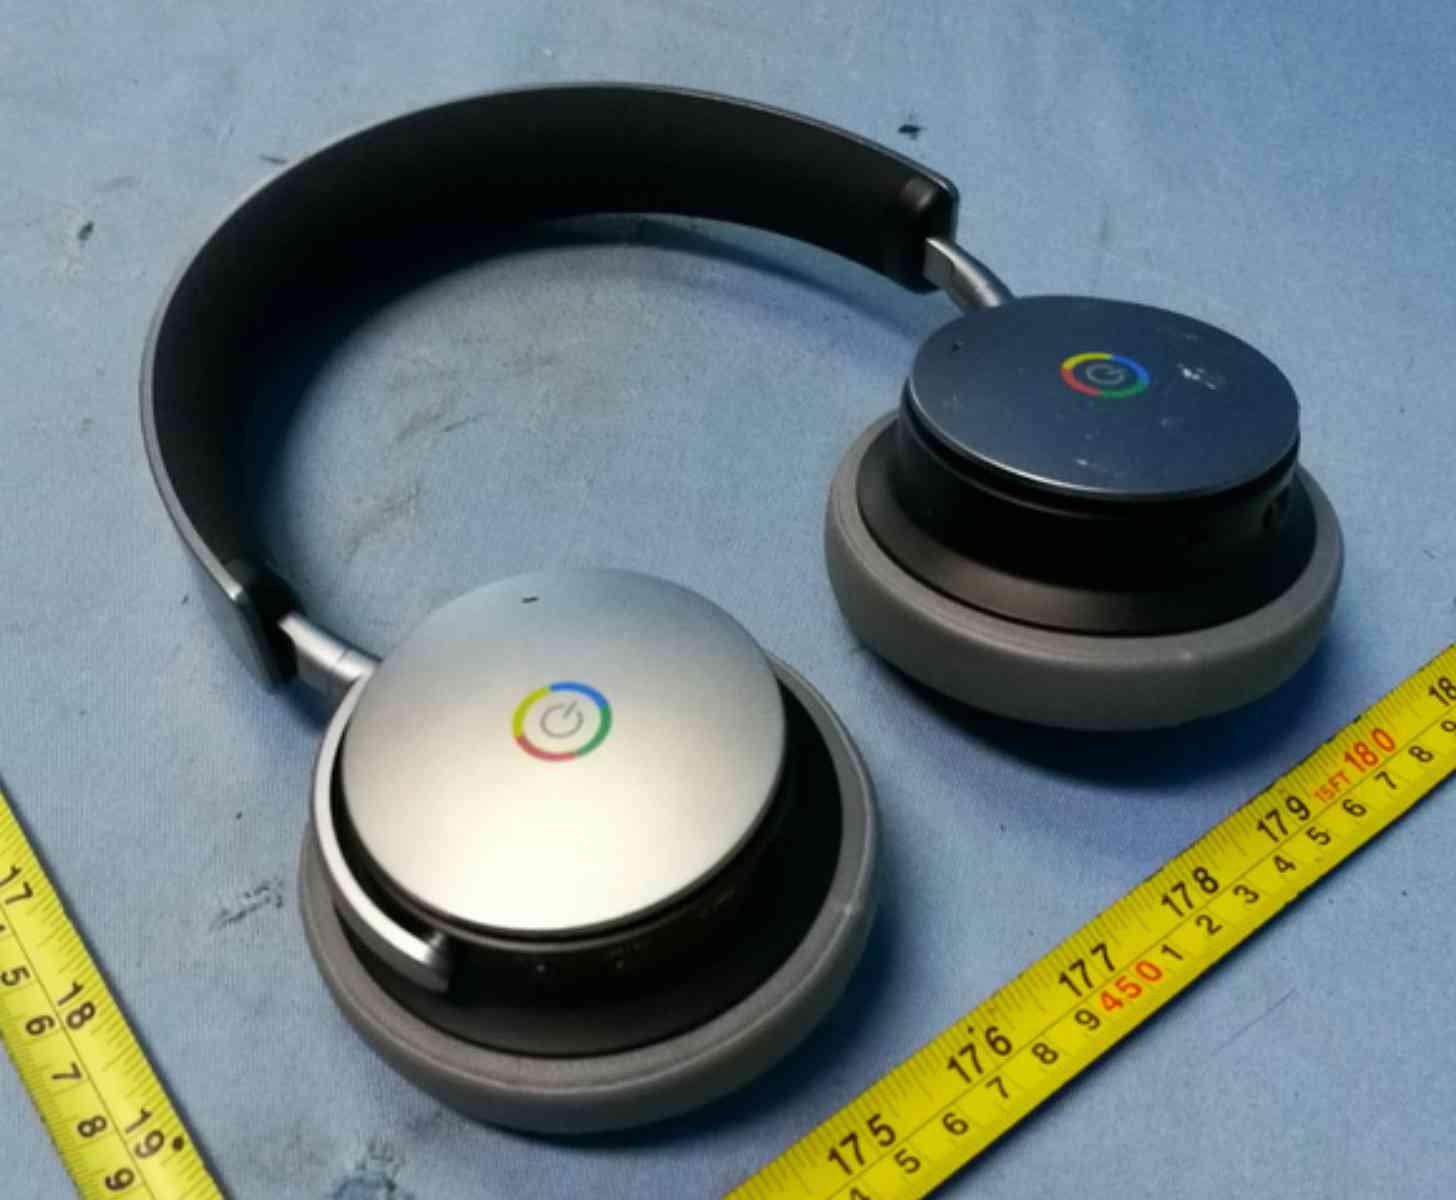 Google Bluetooth headphones FCC photos